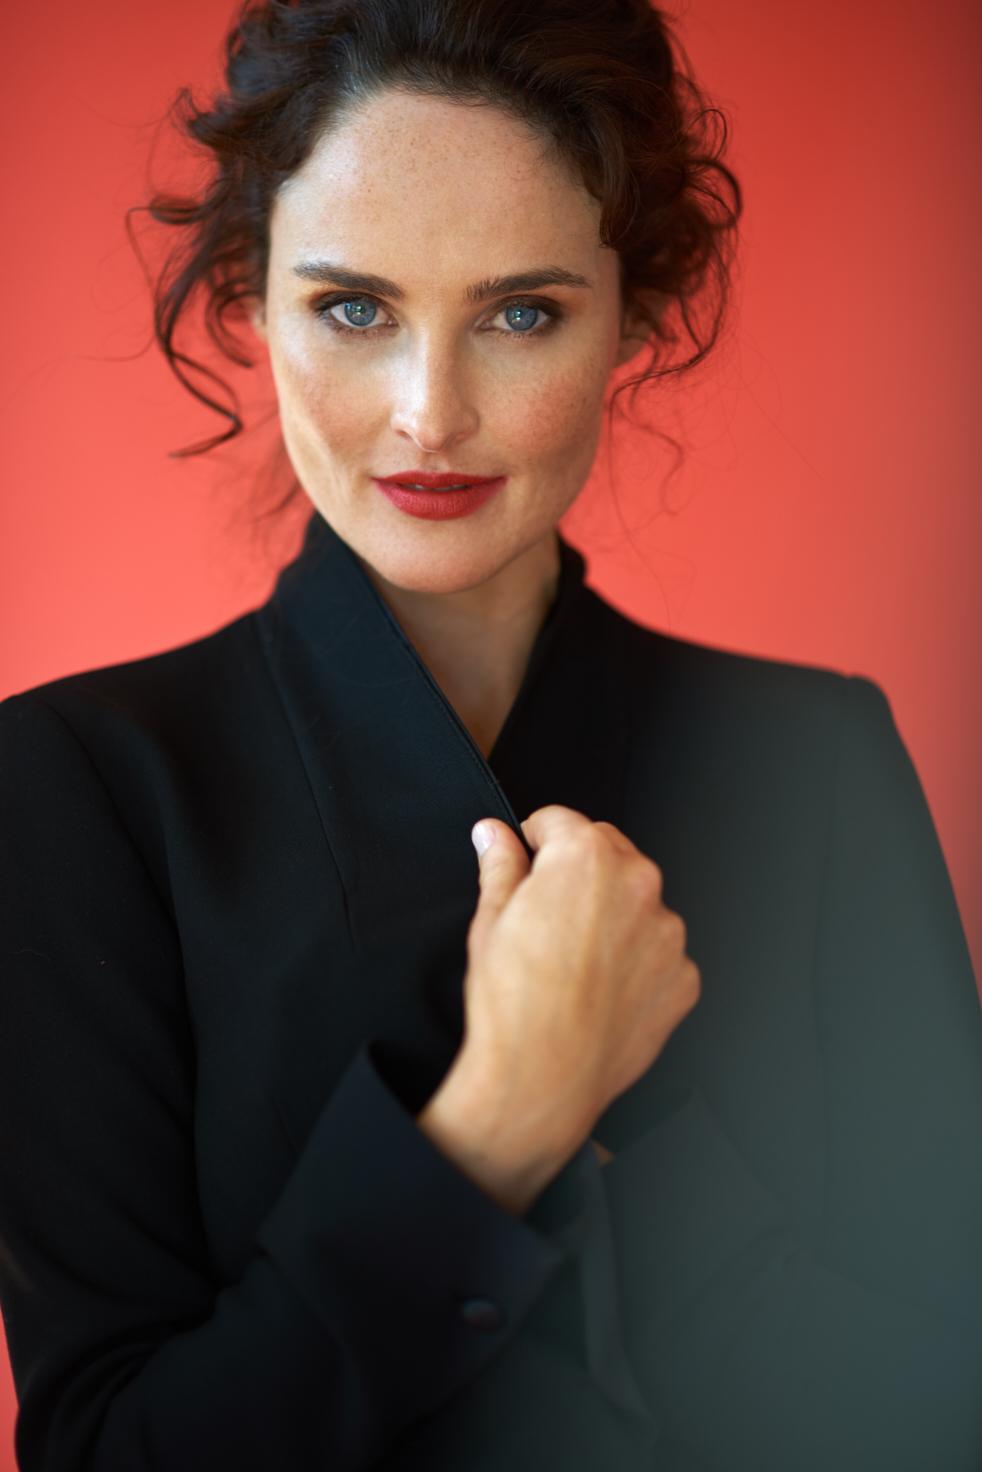 Professional Portraits — Dan Korkelia